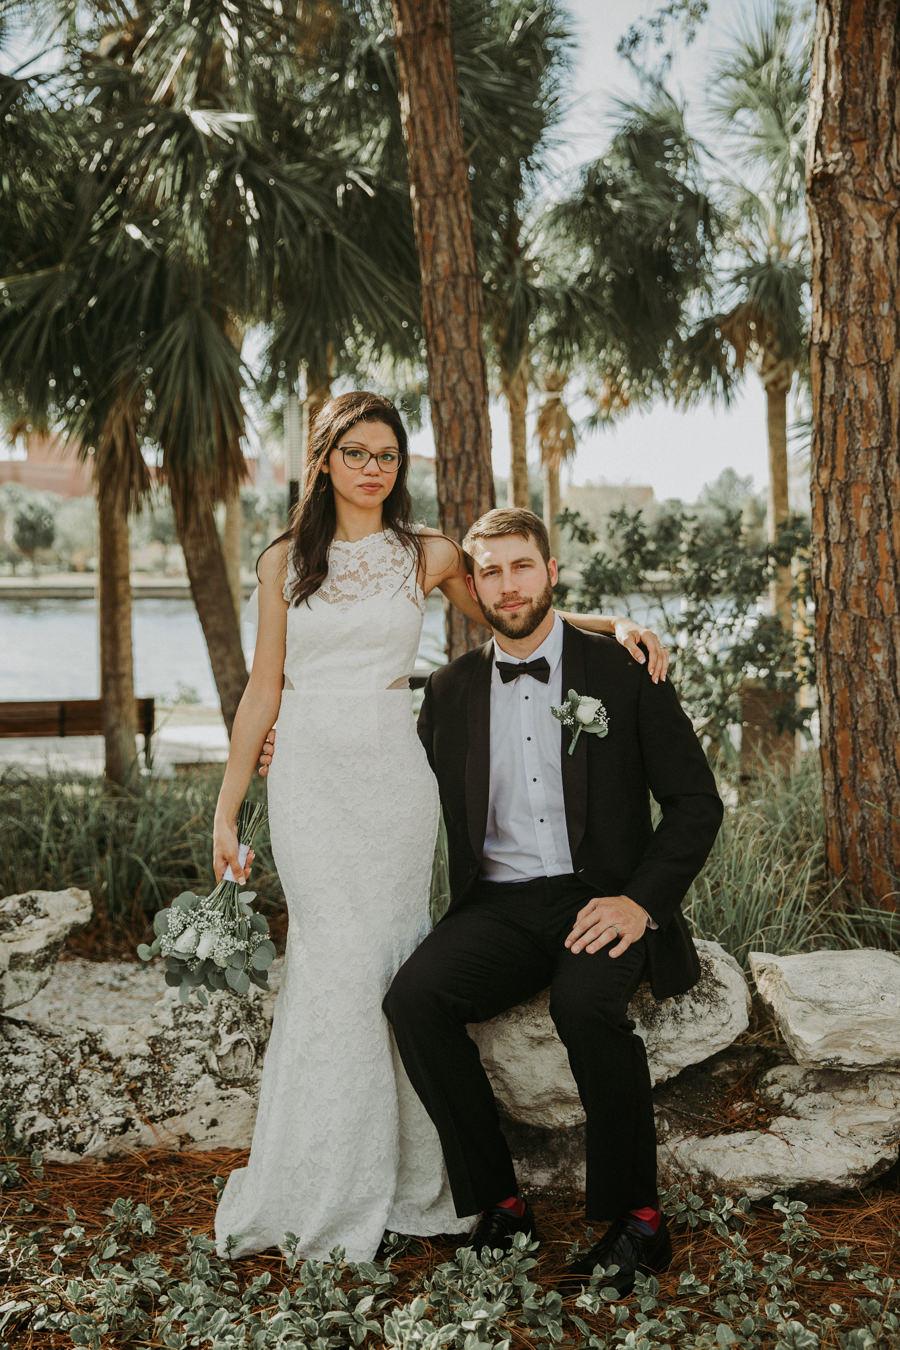 Tampa Heights Industrial Wedding at Cavu Emmy RJ-100.jpg